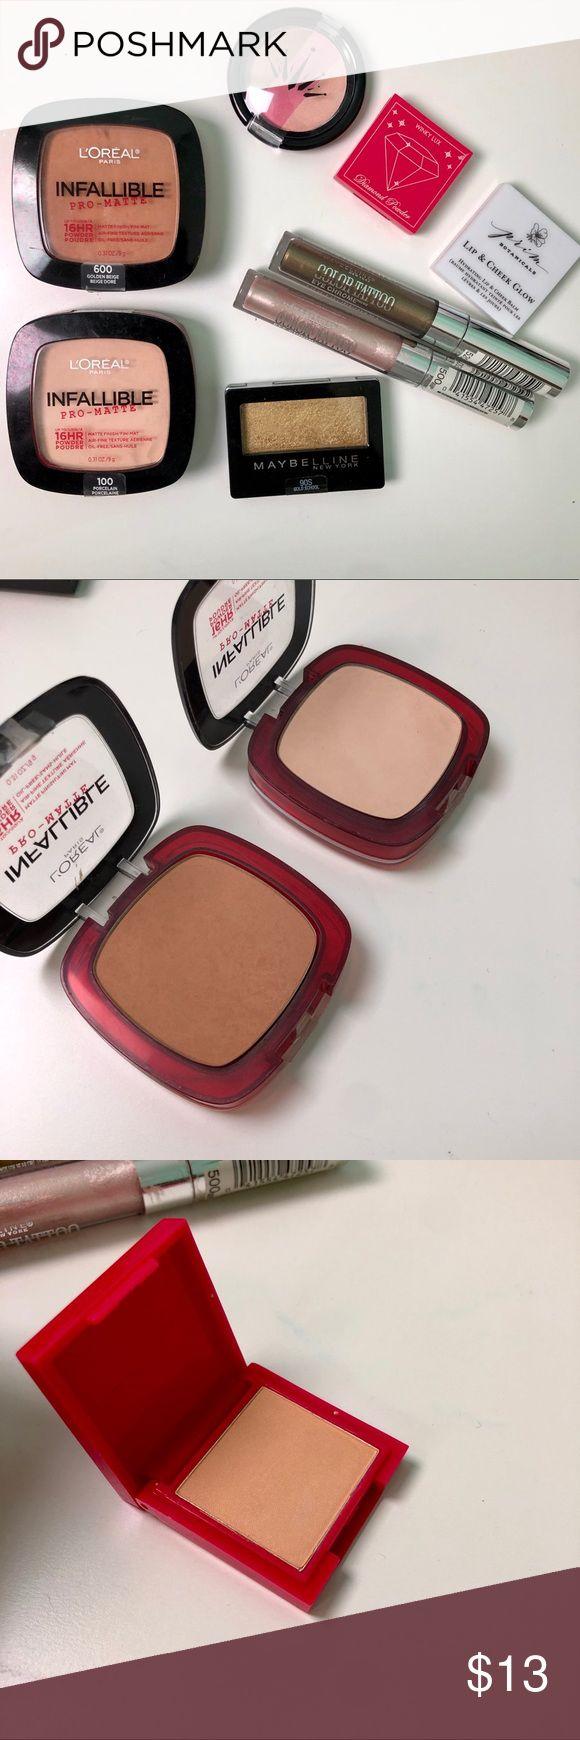 Makeup bundle Maybelline color tattoo eye chrome, Color